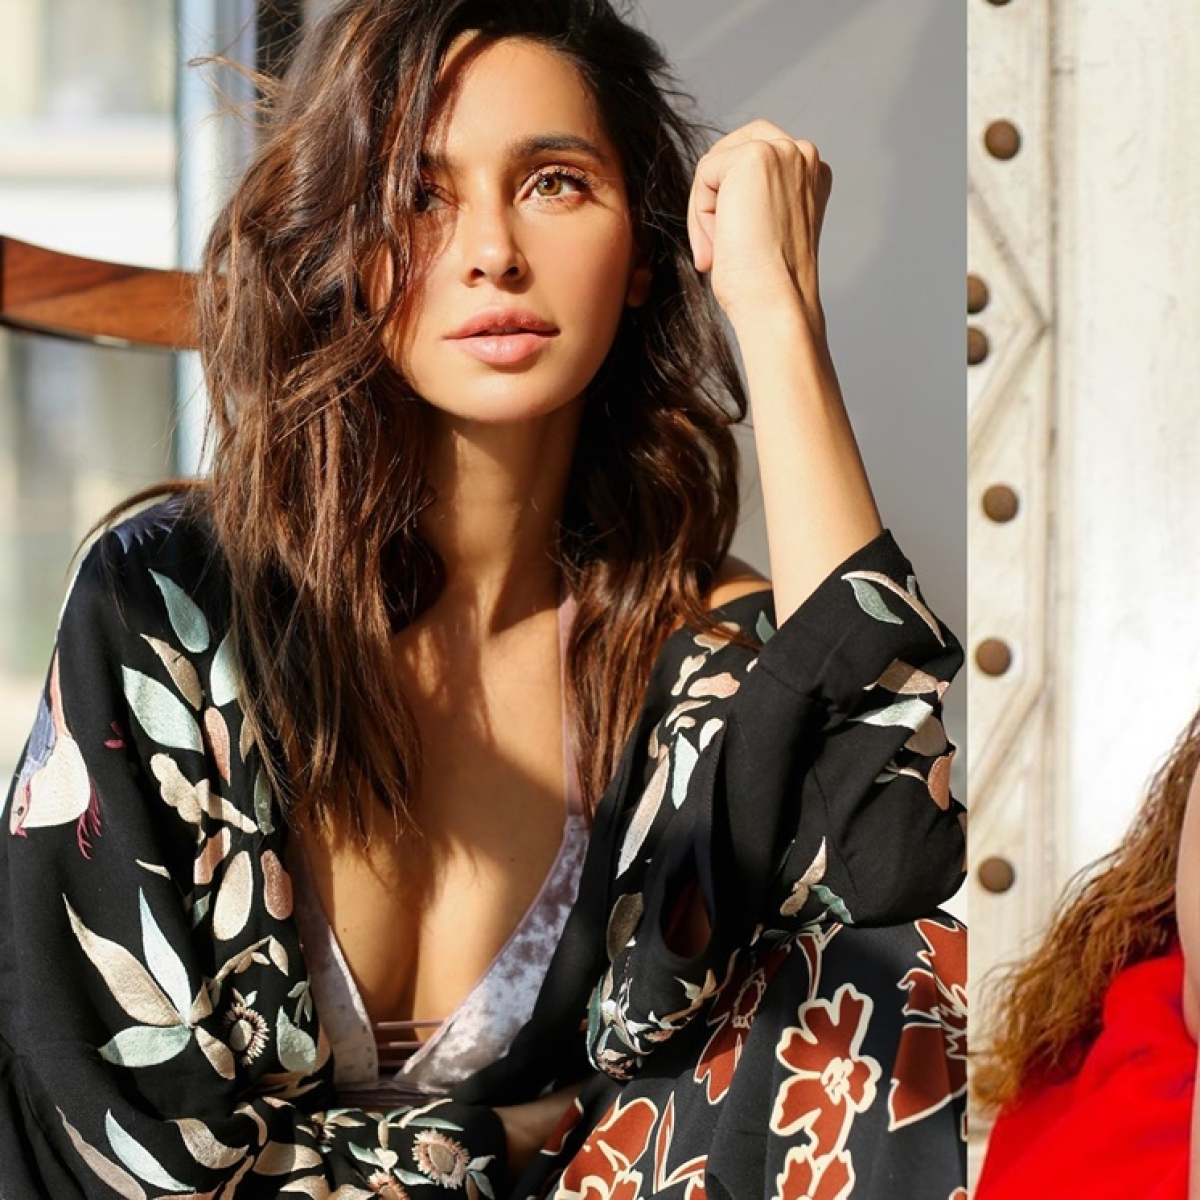 'Wants her 2 seconds of fame': Shibani Dandekar calls out Sushant's ex-GF Ankita Lokhande for targeting Rhea